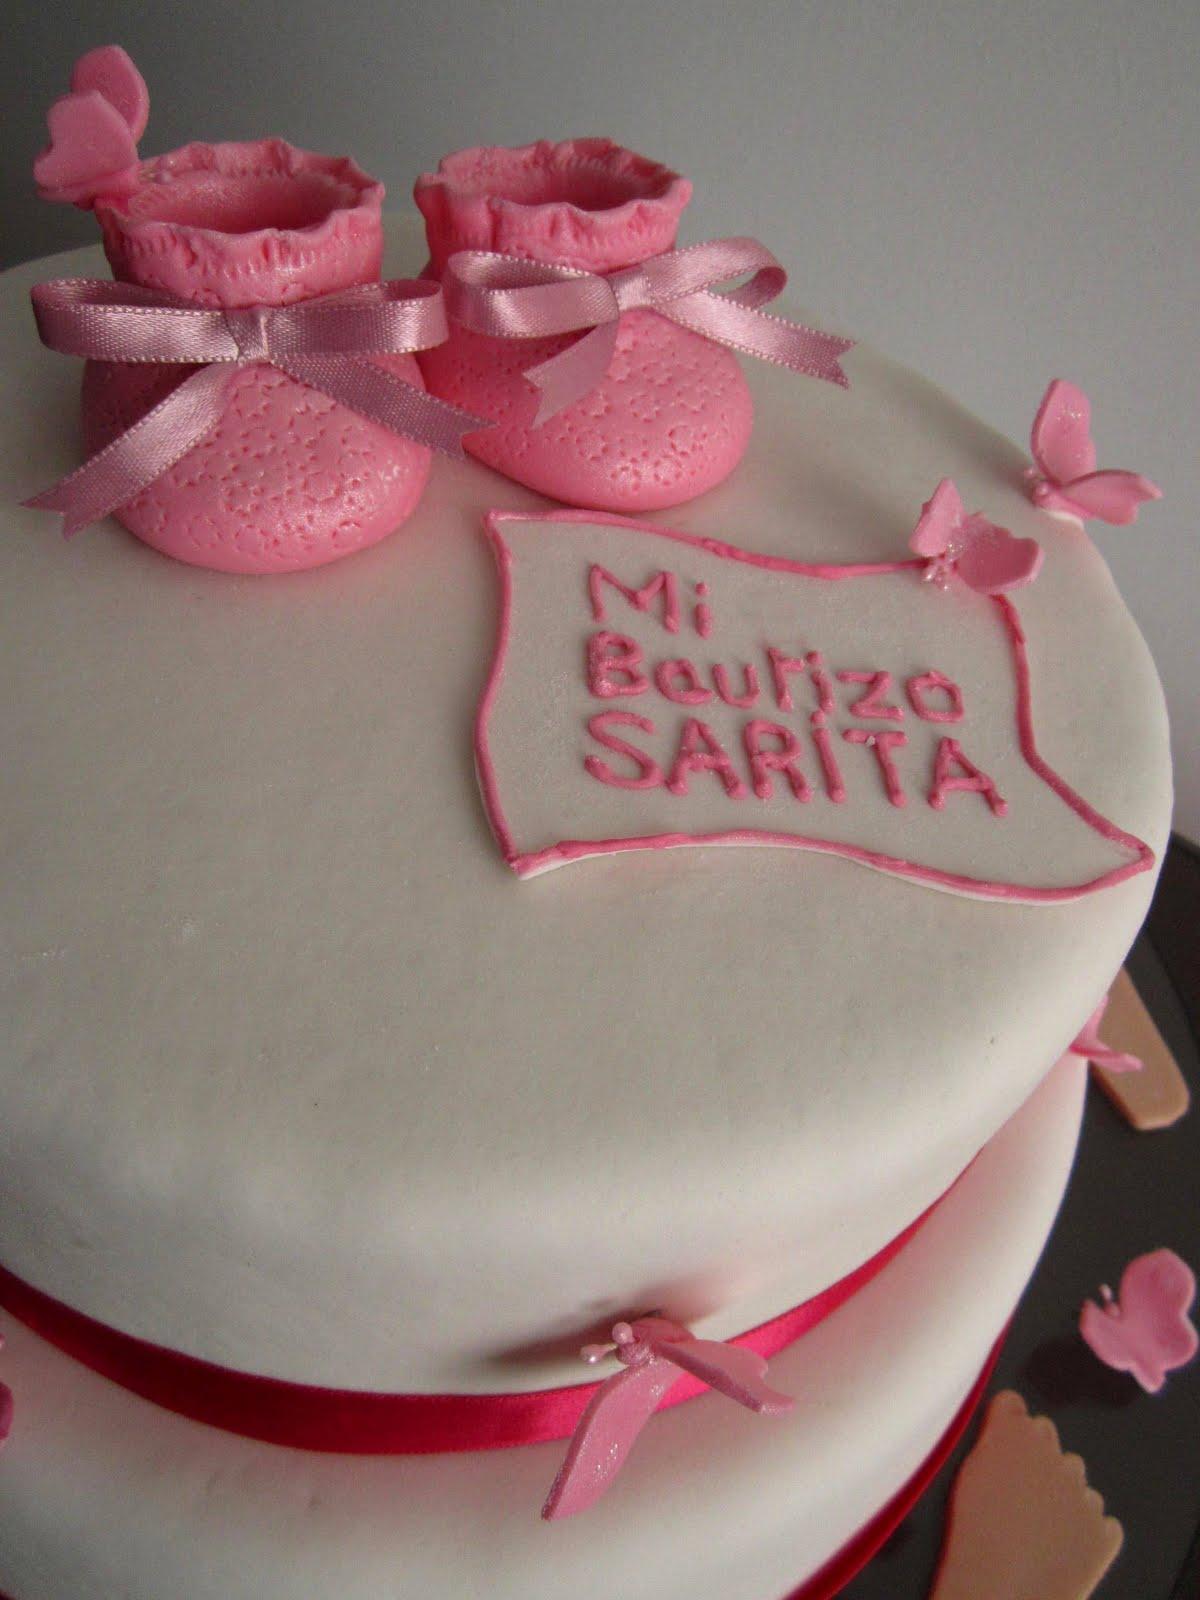 Tortas y Ponques Lucia: Torta para Bautizo